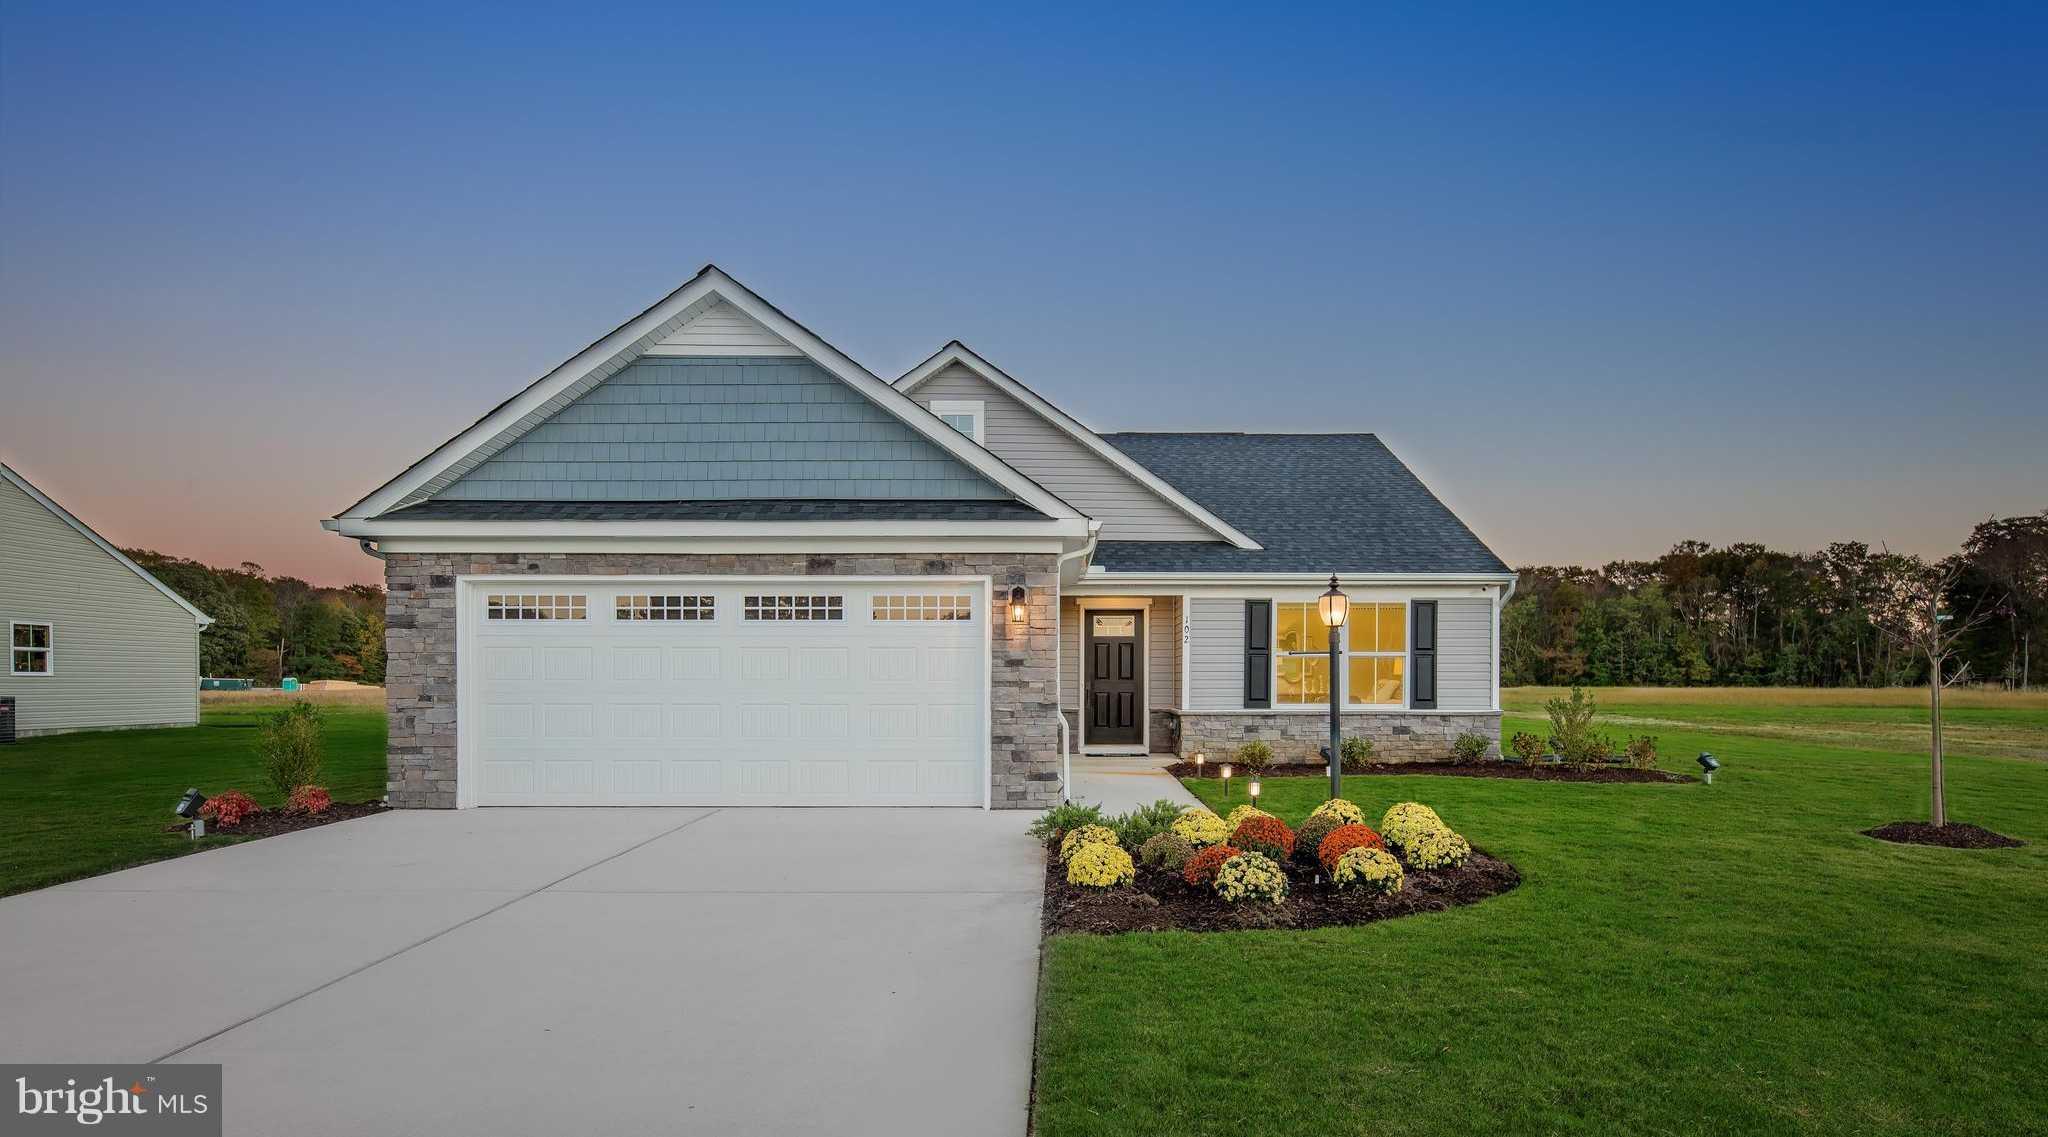 $248,265 - 3Br/2Ba -  for Sale in Arcadia Springs, Martinsburg